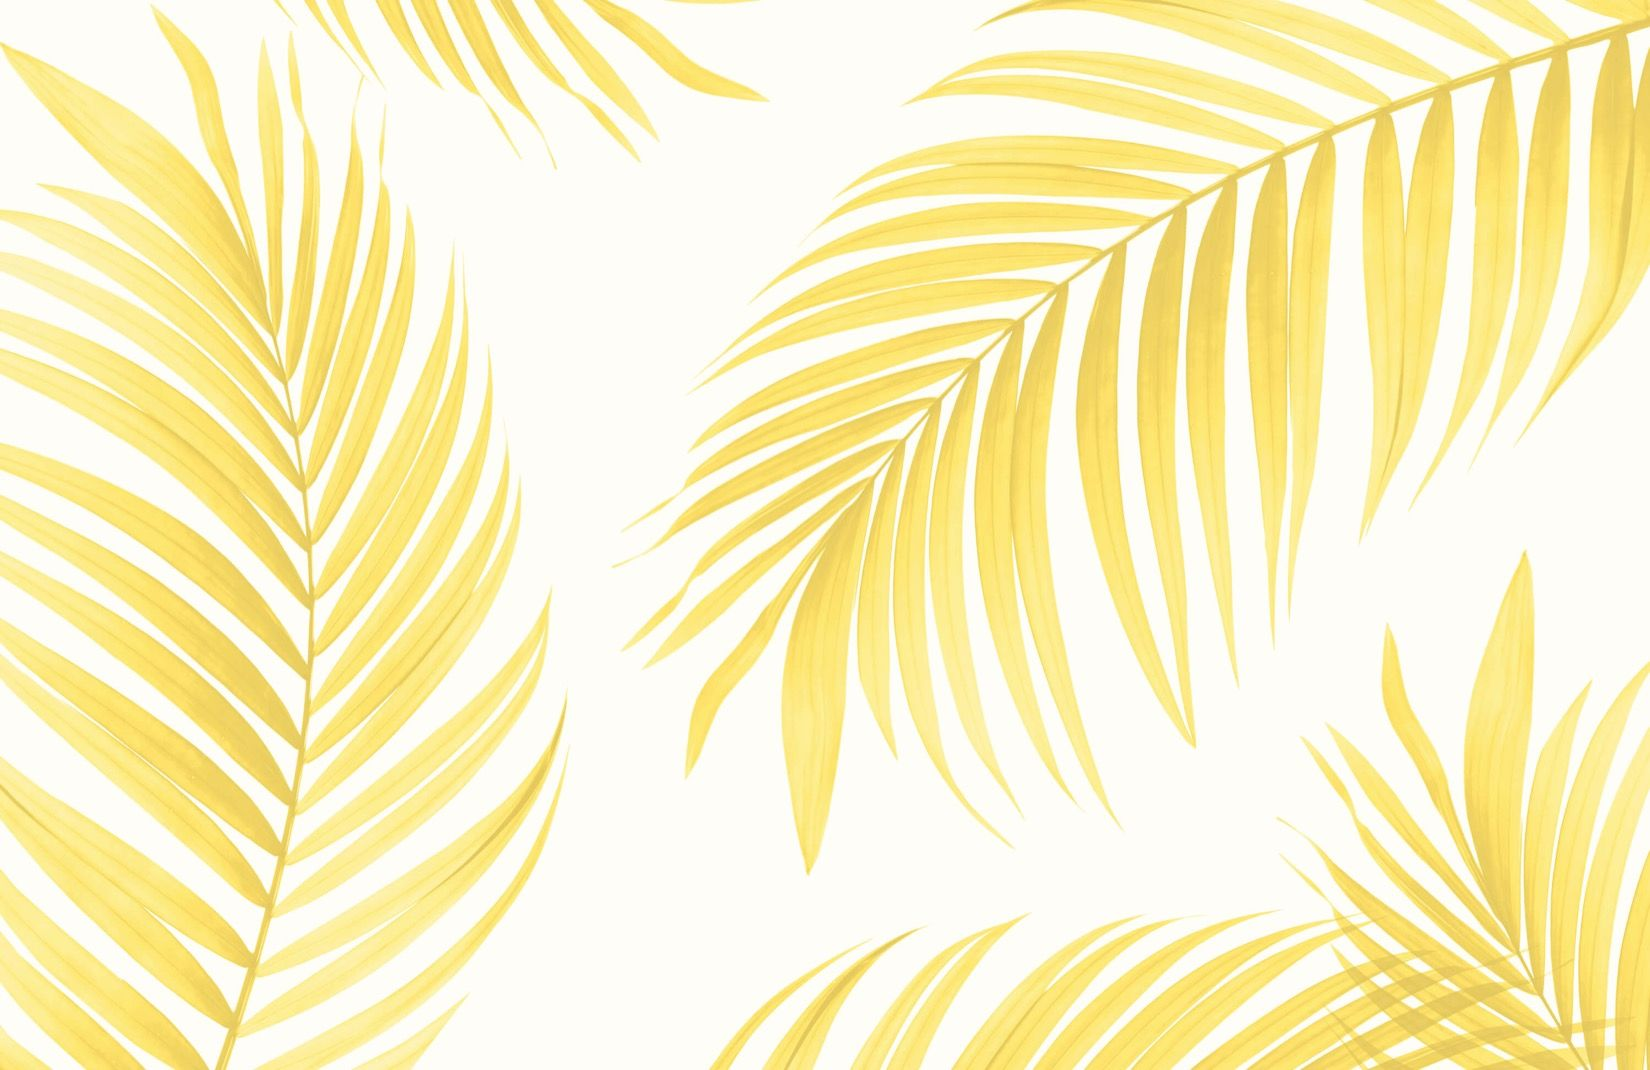 Yellow Tropical Palm Wallpaper Mural Muralswallpaper Palm Wallpaper Tropical Wallpaper Mural Wallpaper